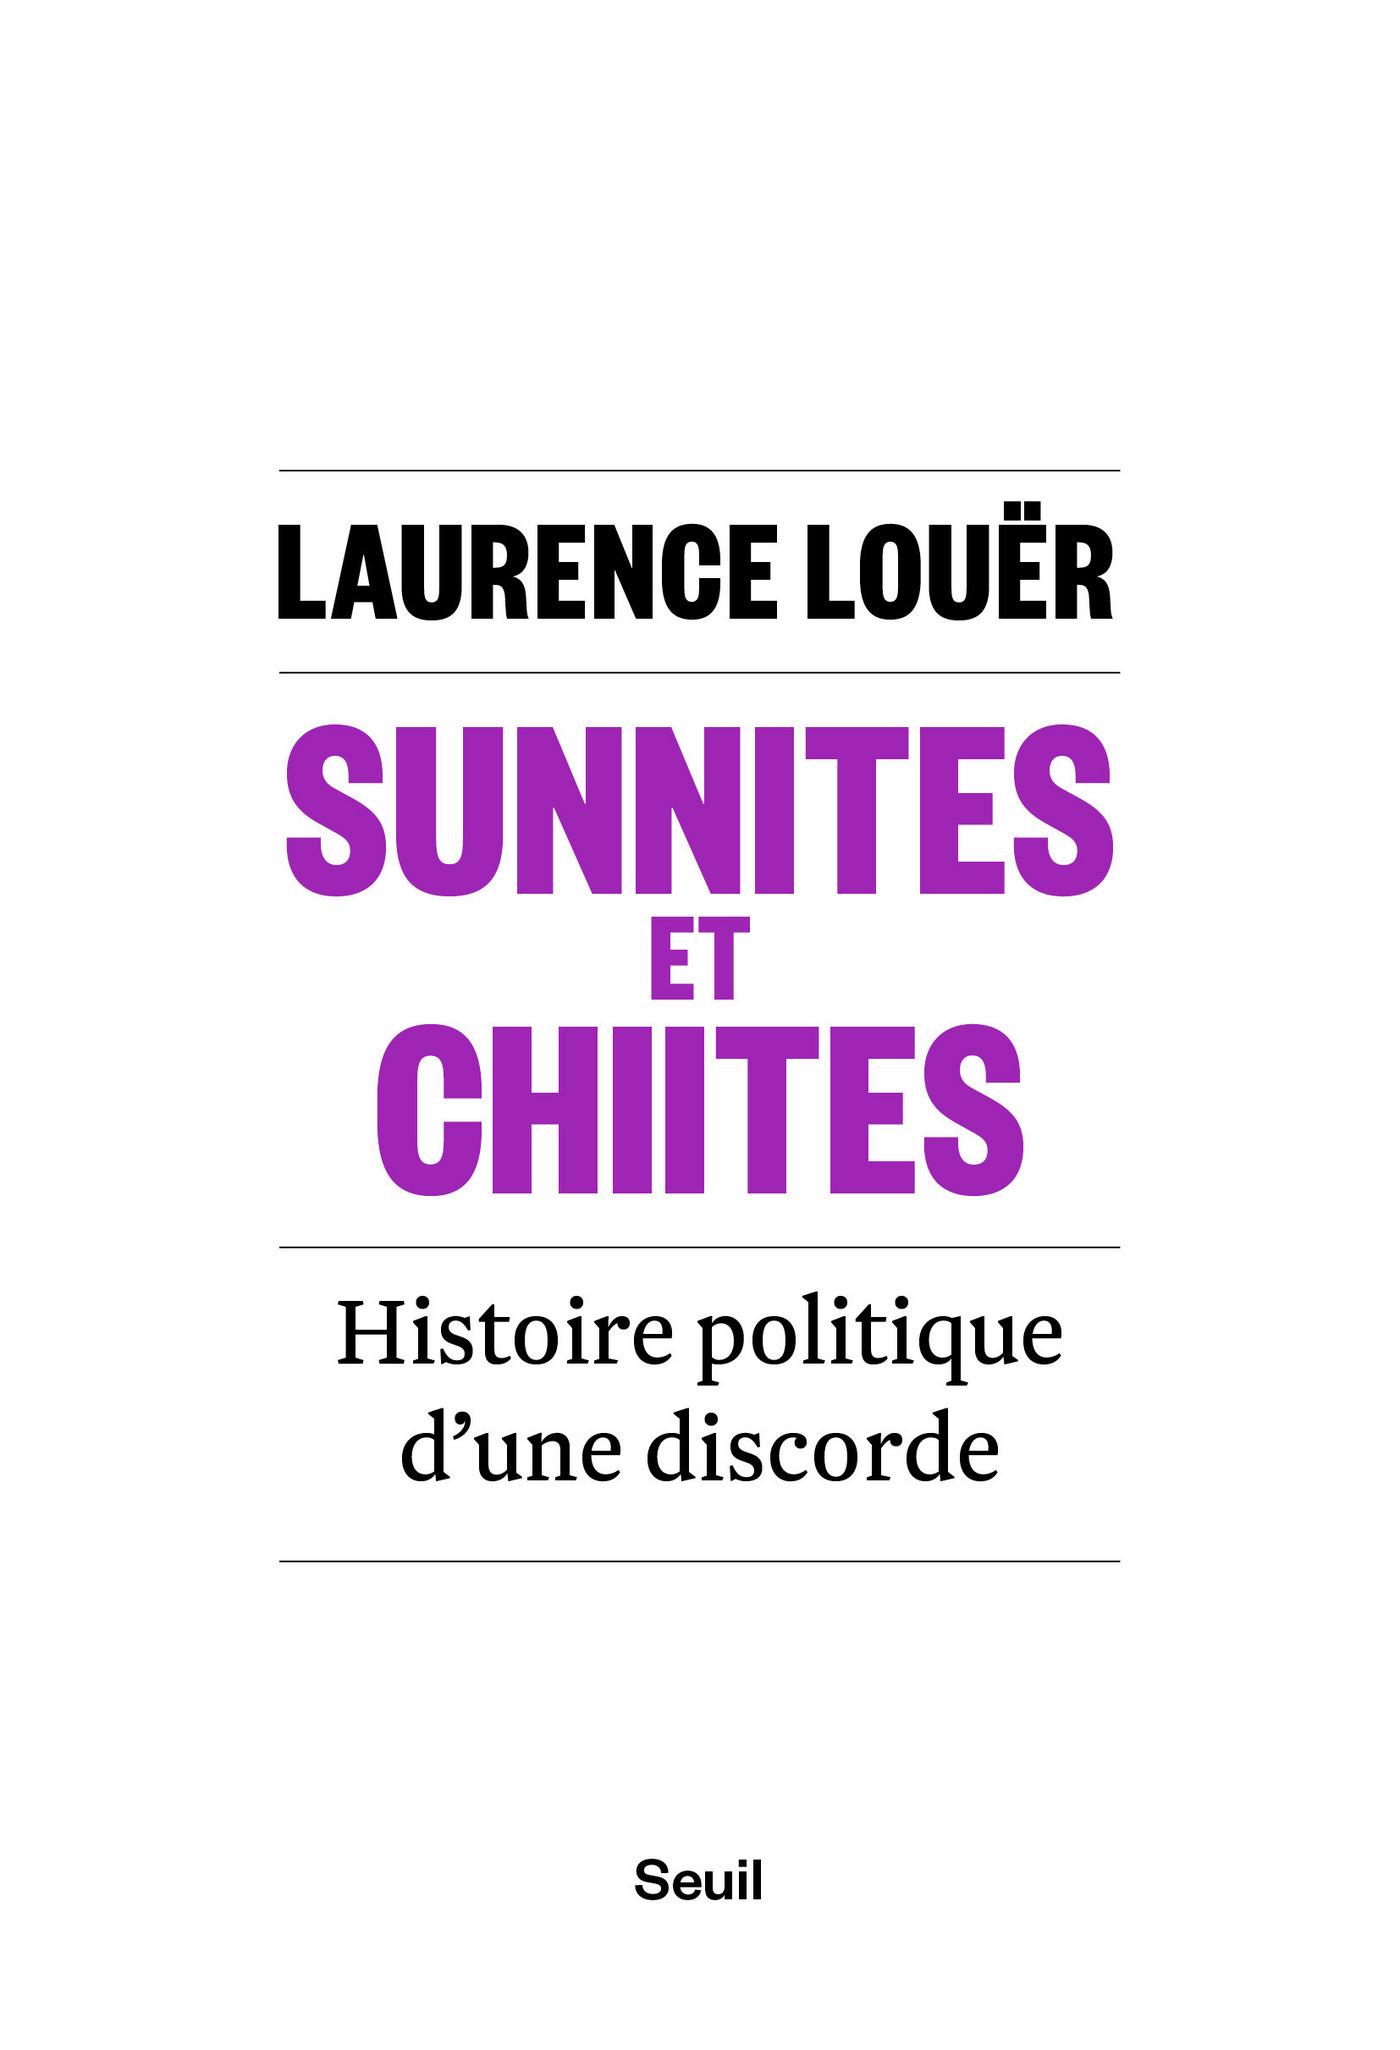 Sunnites et Chiites. Histoire politique d'une discorde